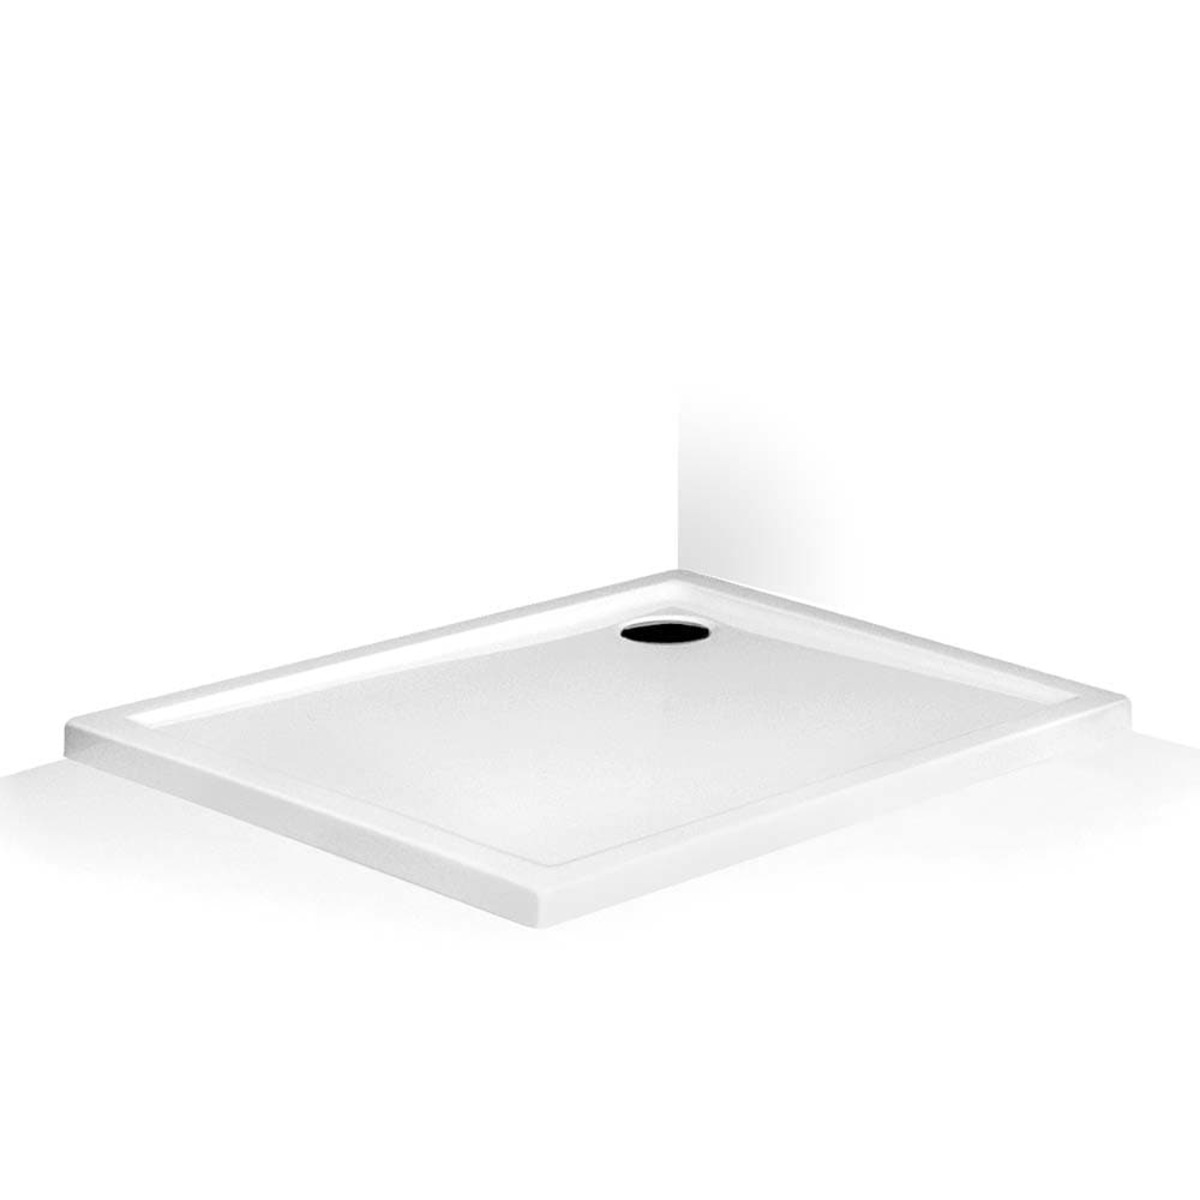 Sprchová vanička obdélníková Roth 130x90 cm akrylát 8000253